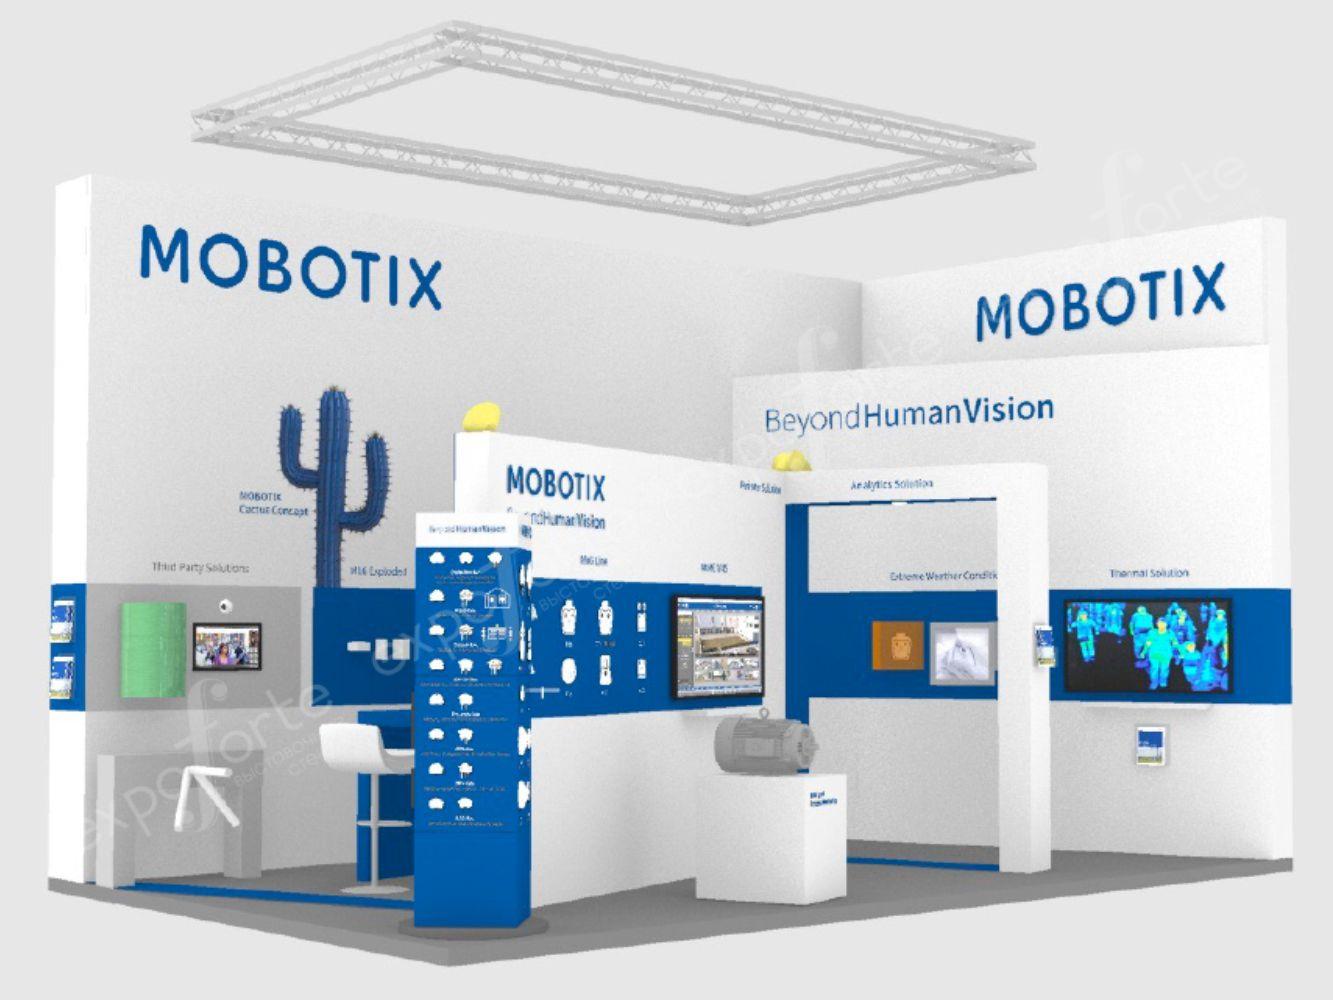 Фото: MOBOTIX, выставка MIPS – картинка 3